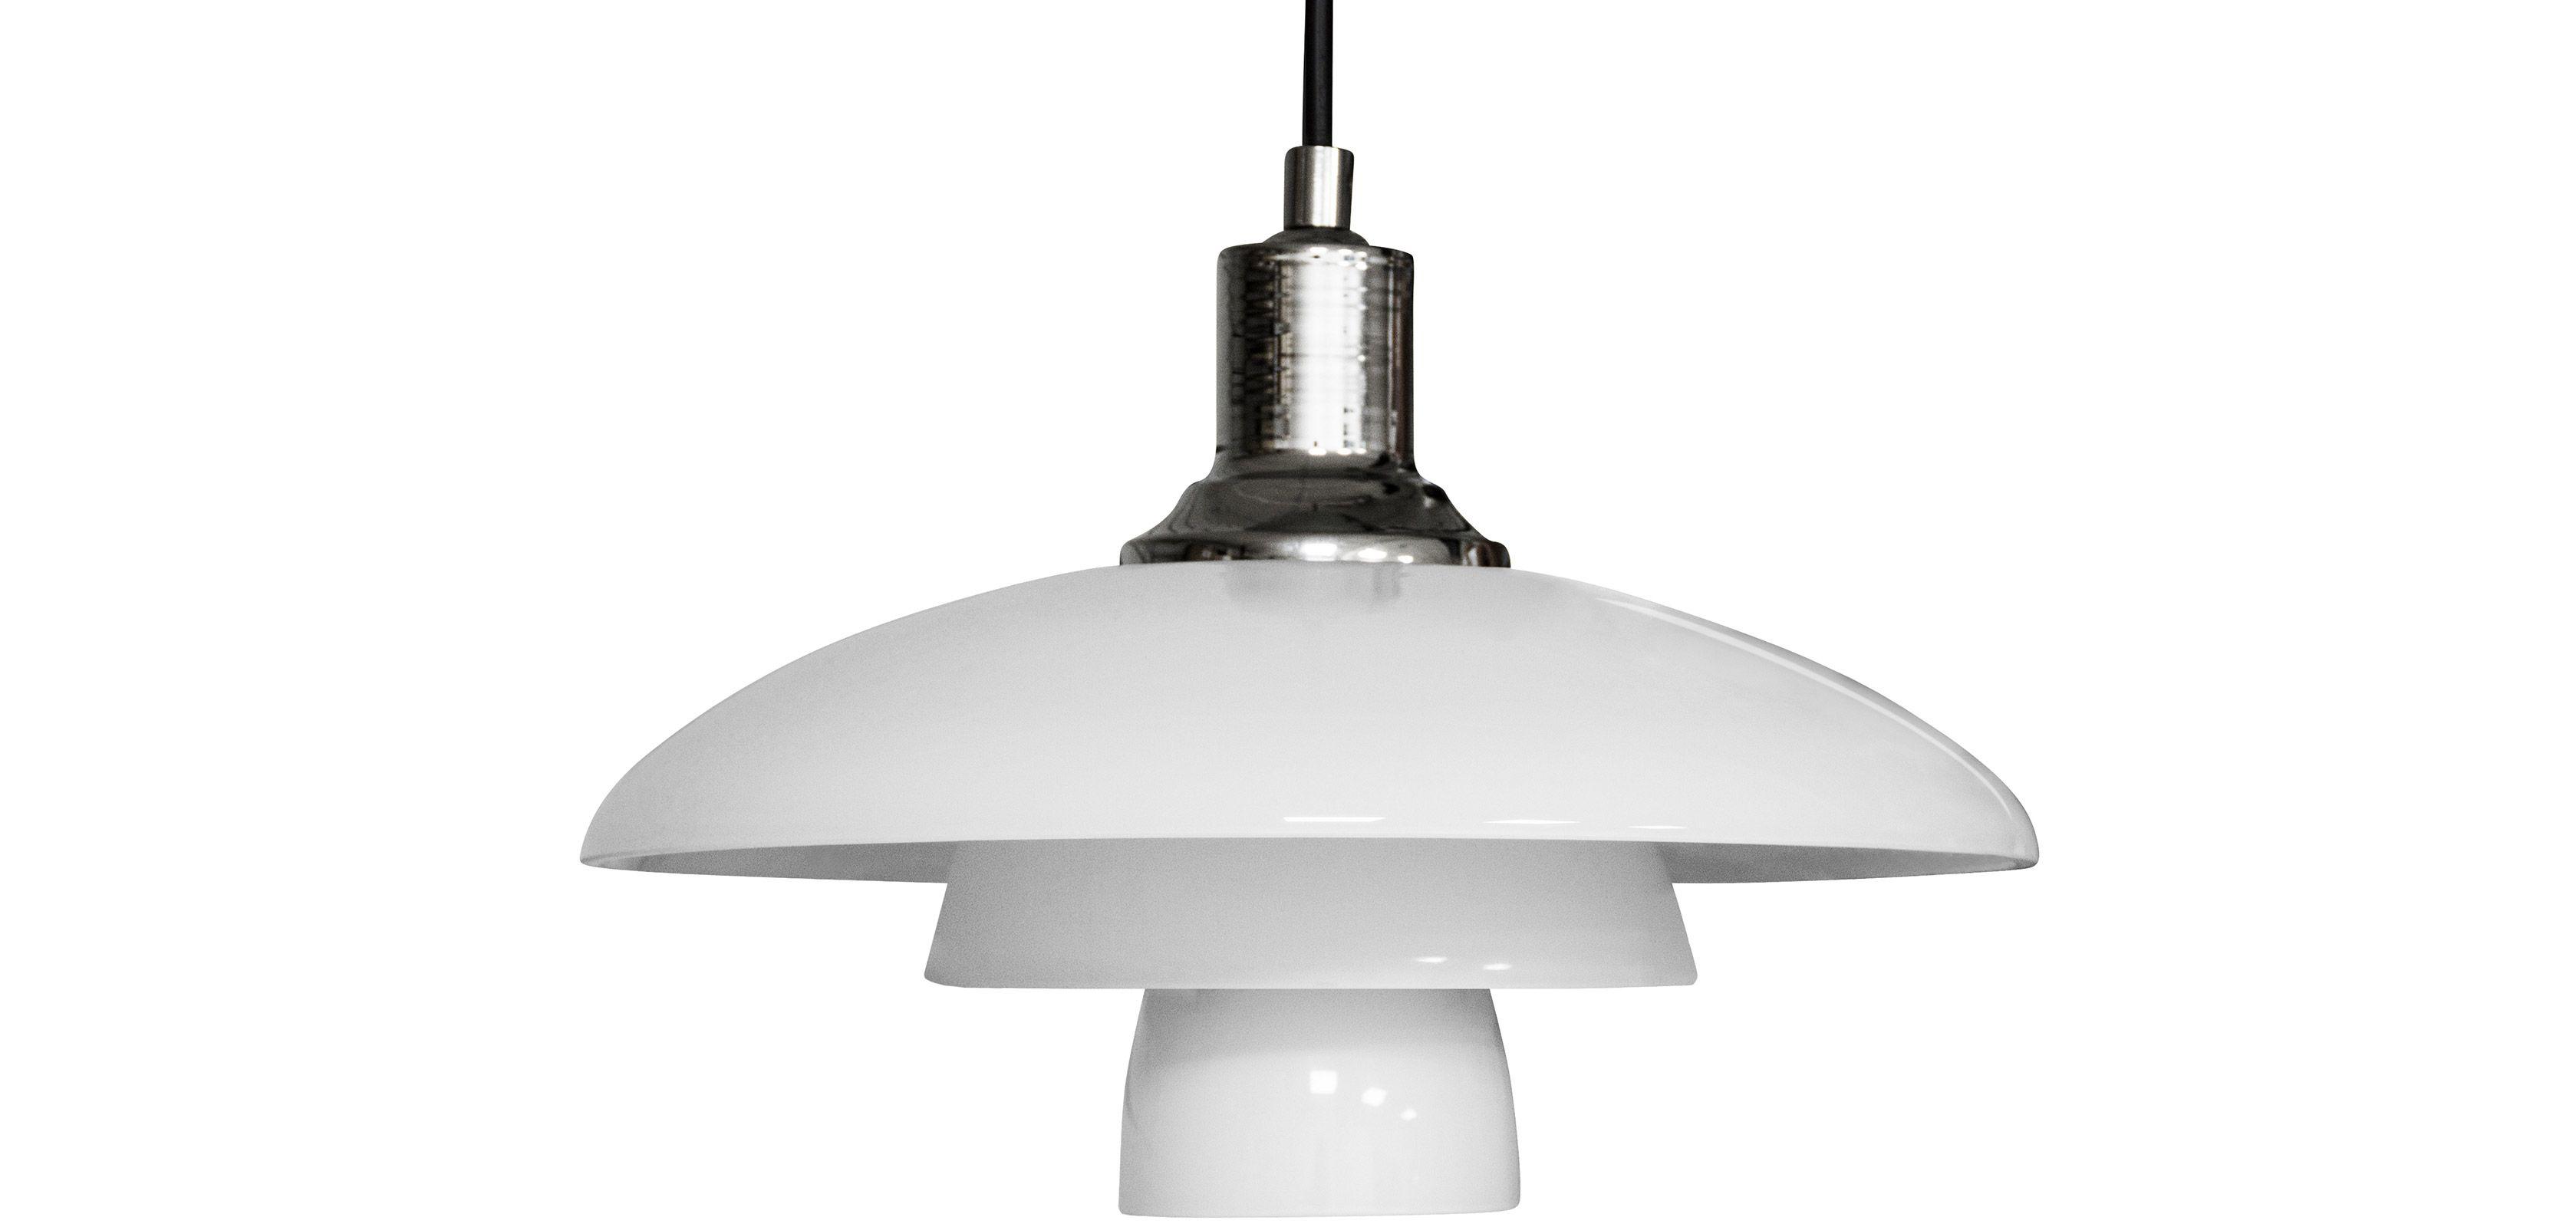 96 Pl 2 1 Hangeleuchte Weiss Stahl Opalglas Illuminazione Soffitto Lampadario Vetrate